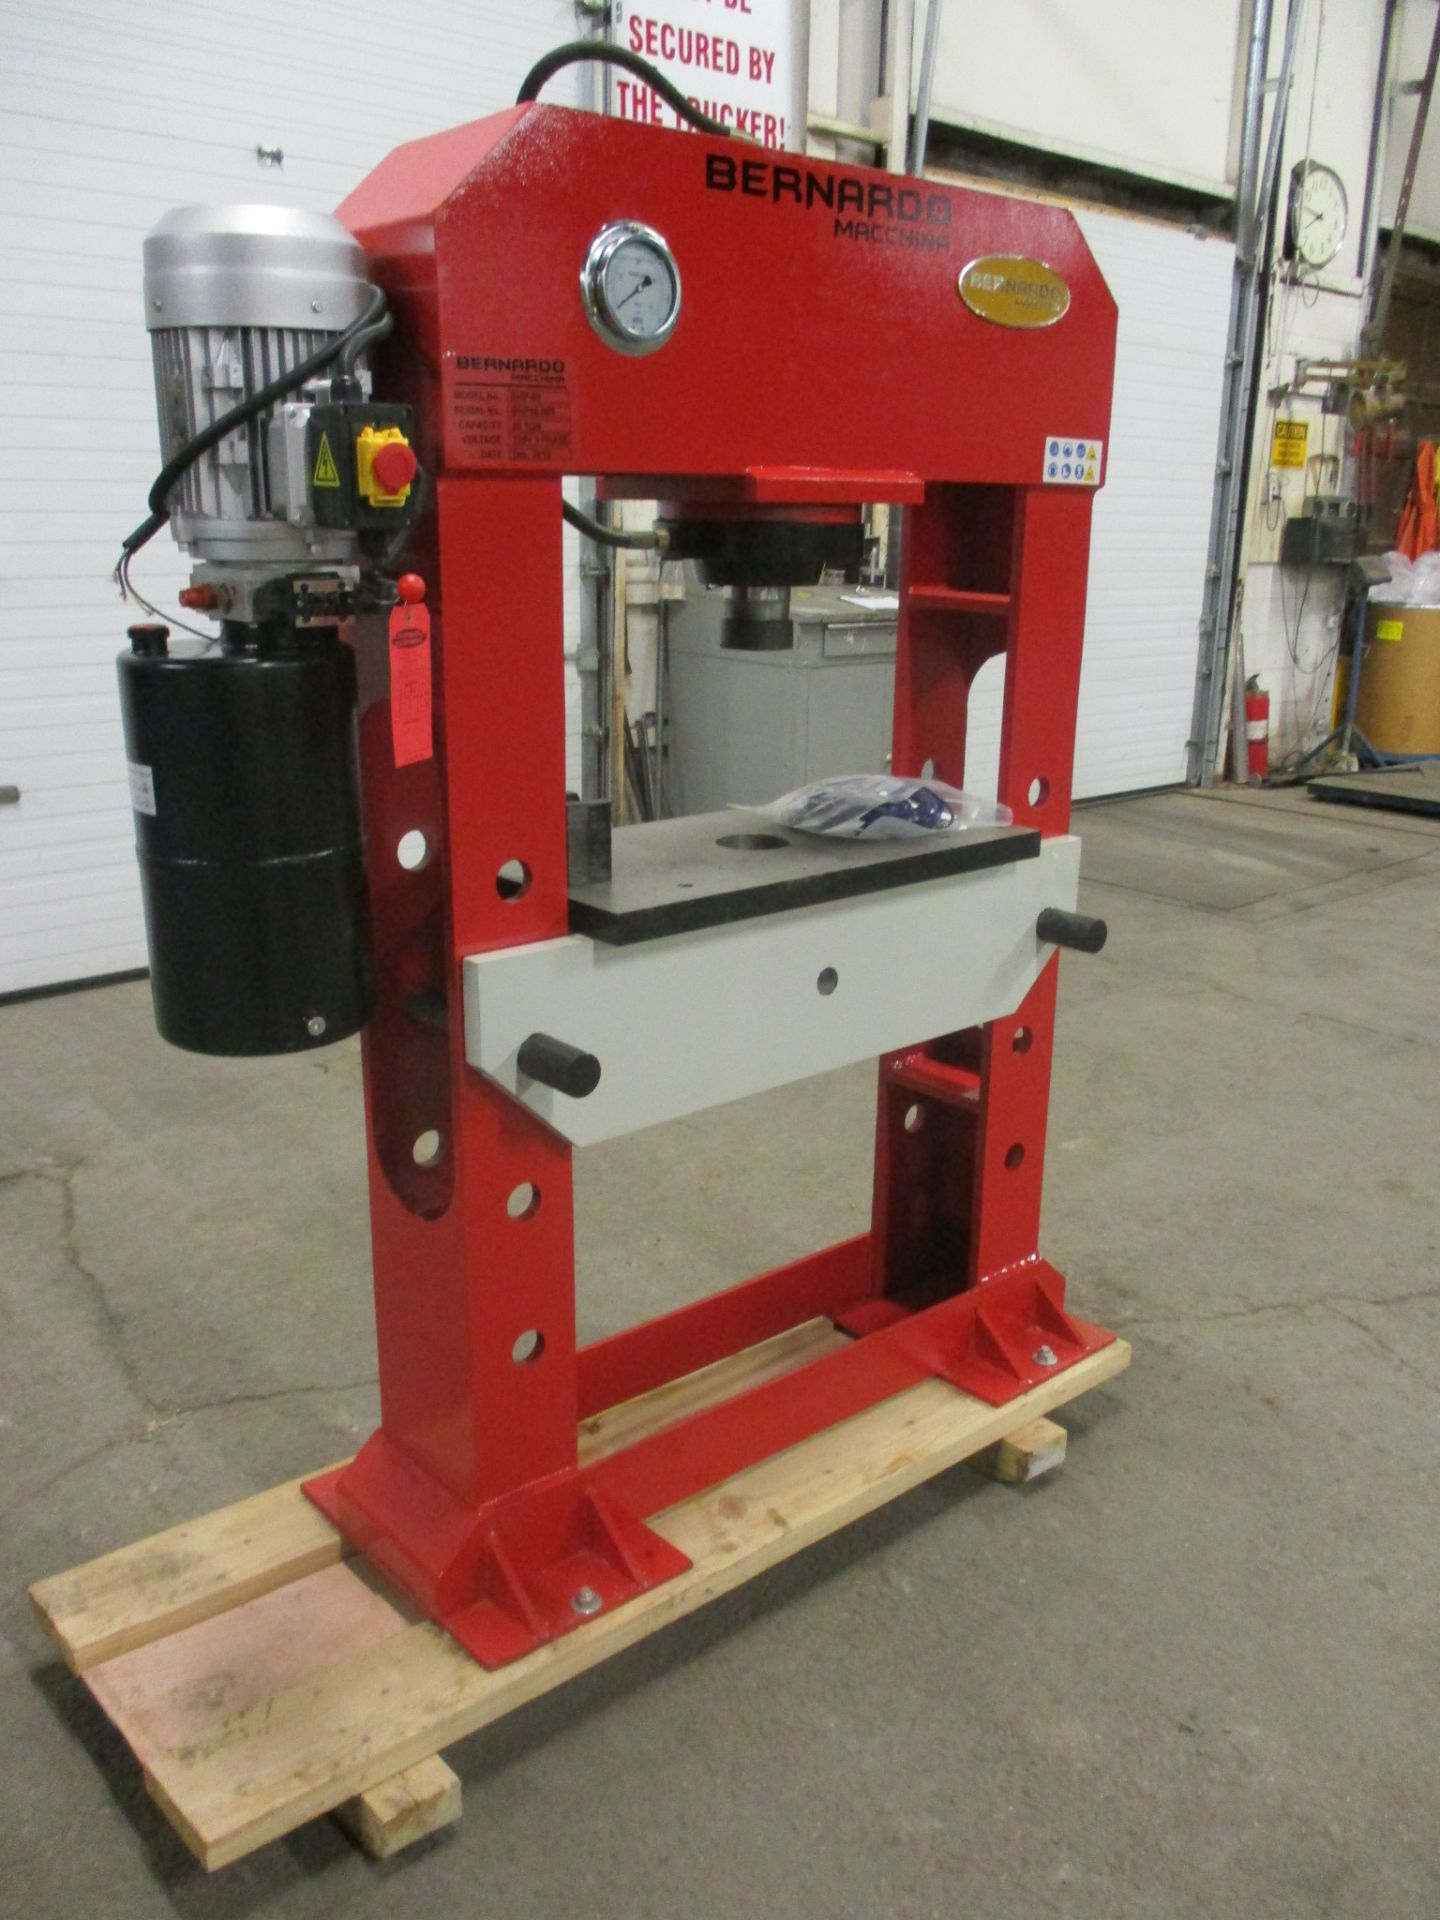 Bernardo Macchina model BHP-80 H-Frame Press 80 Ton Capacity with adjustable table height, hydraulic